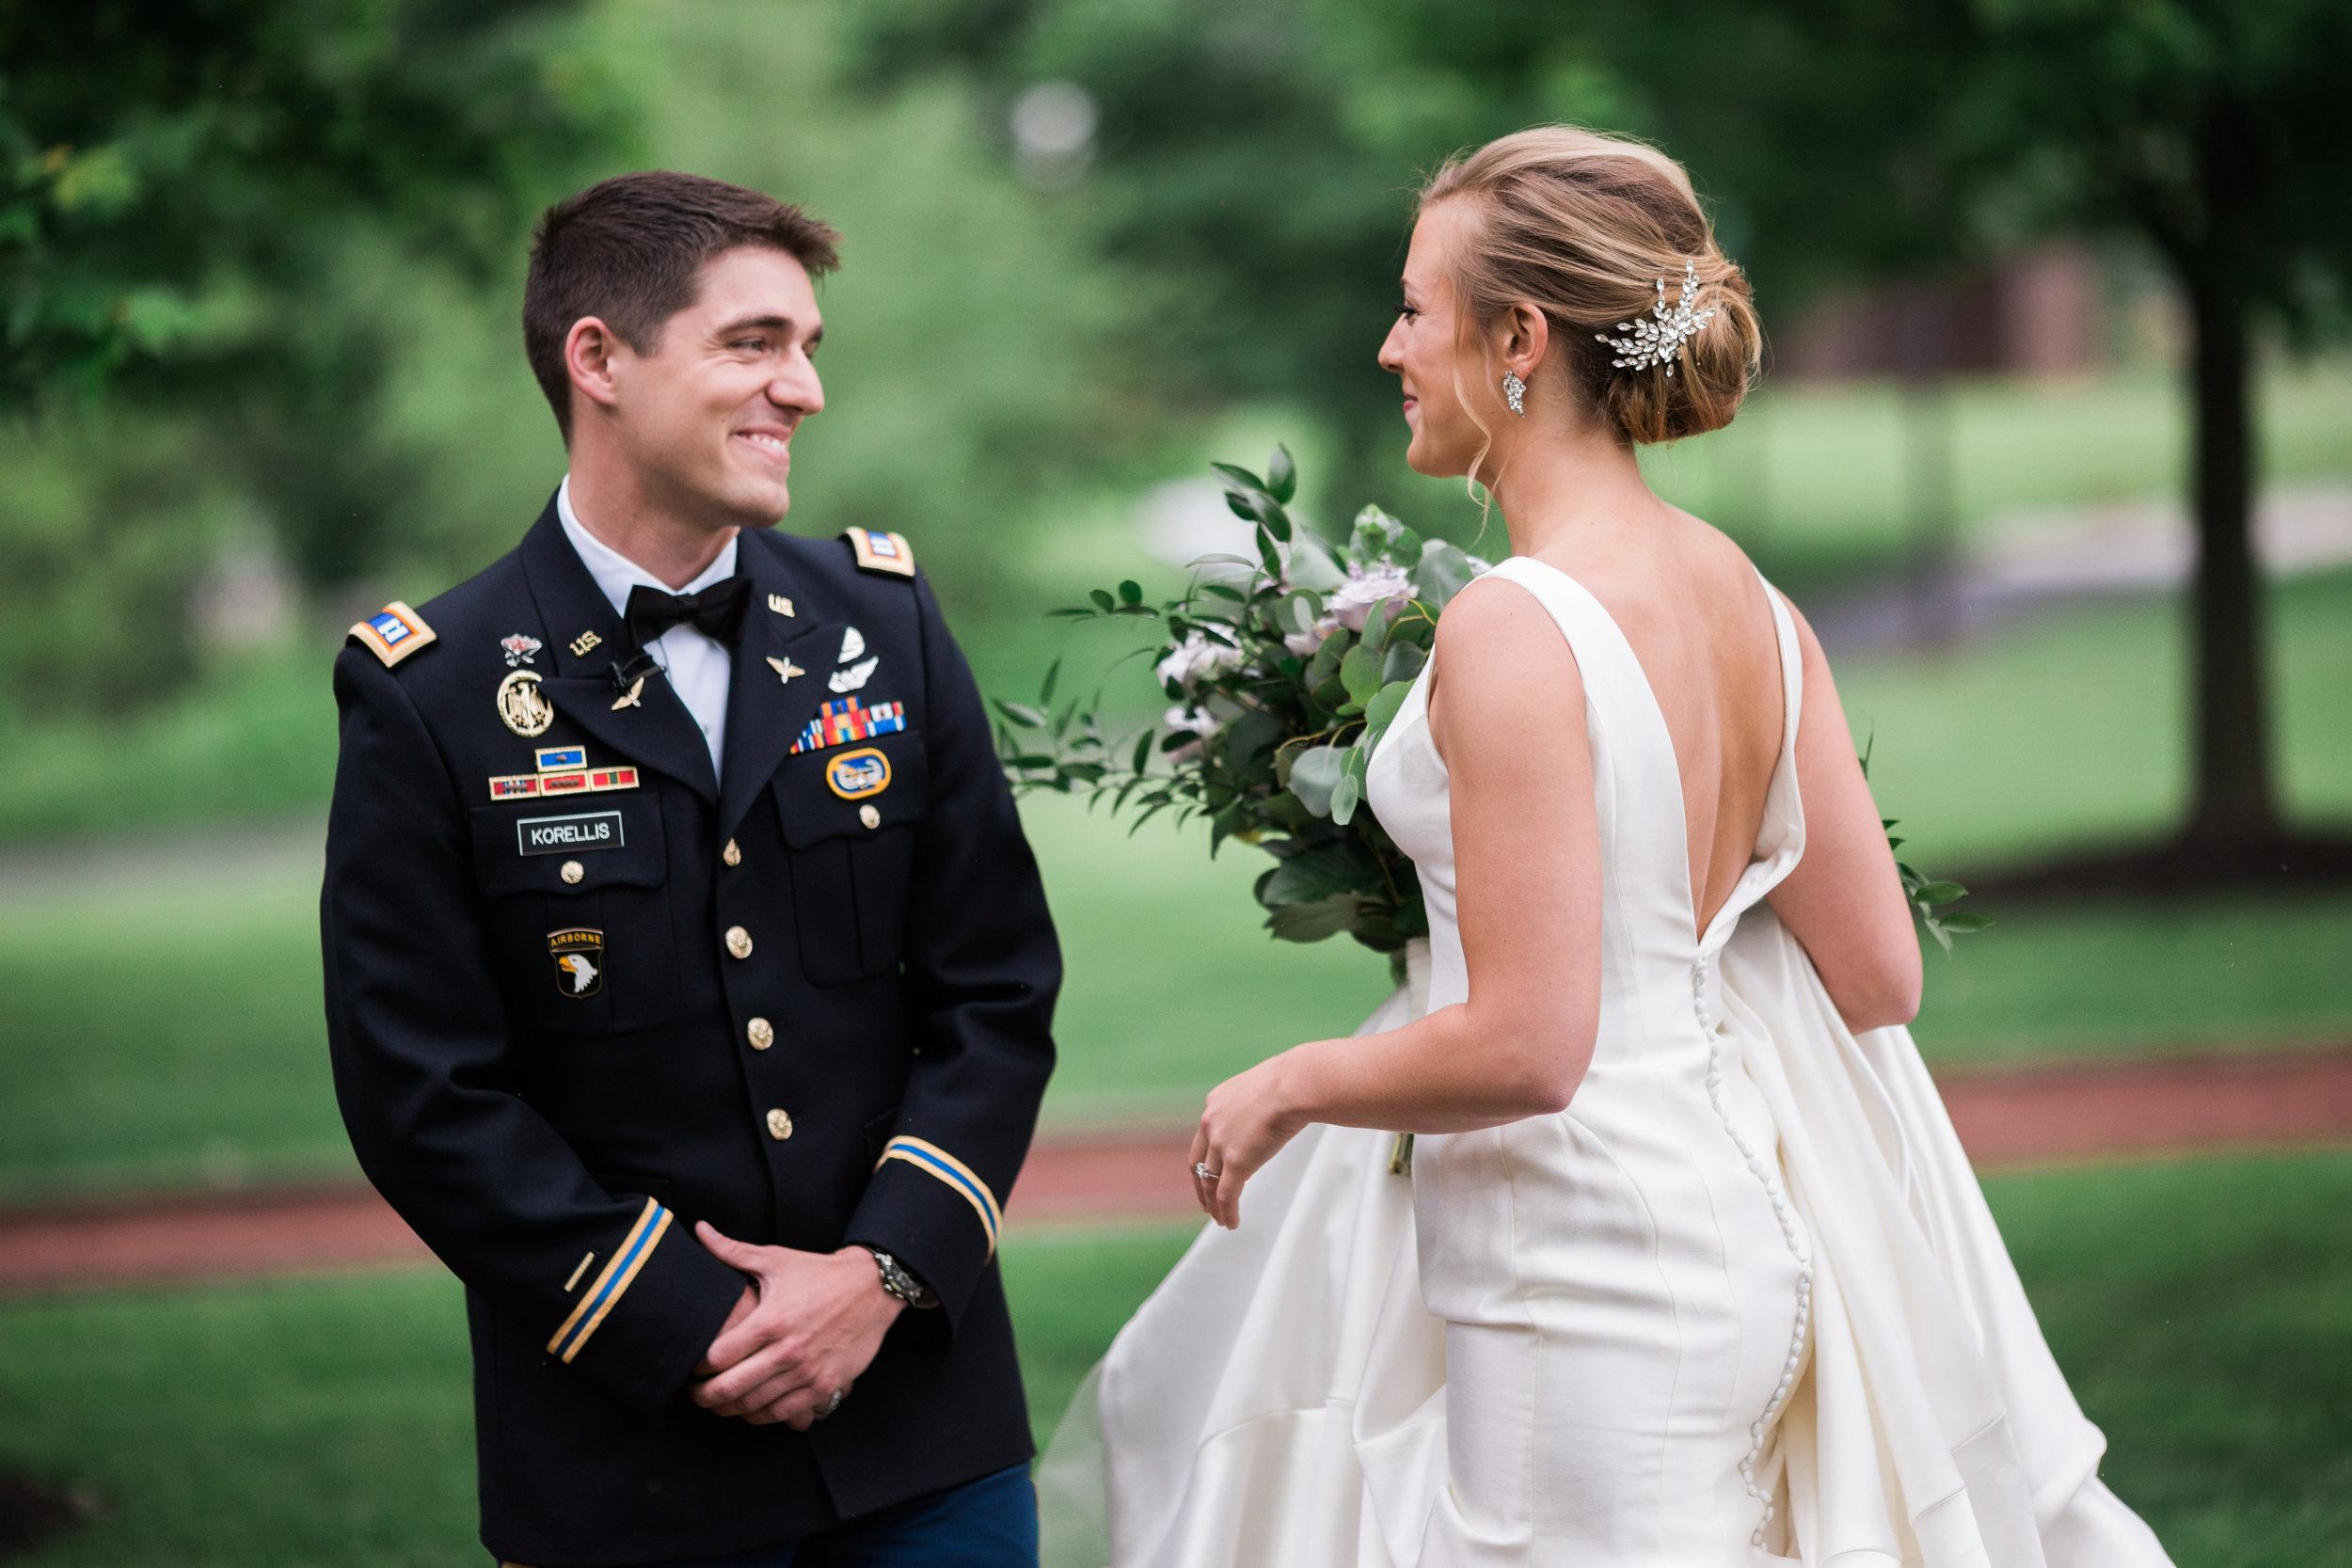 Centennial-Park-Munster-indiana-bride-and-groom-Lauren-ashley-studios-grooms-reaction.jpg